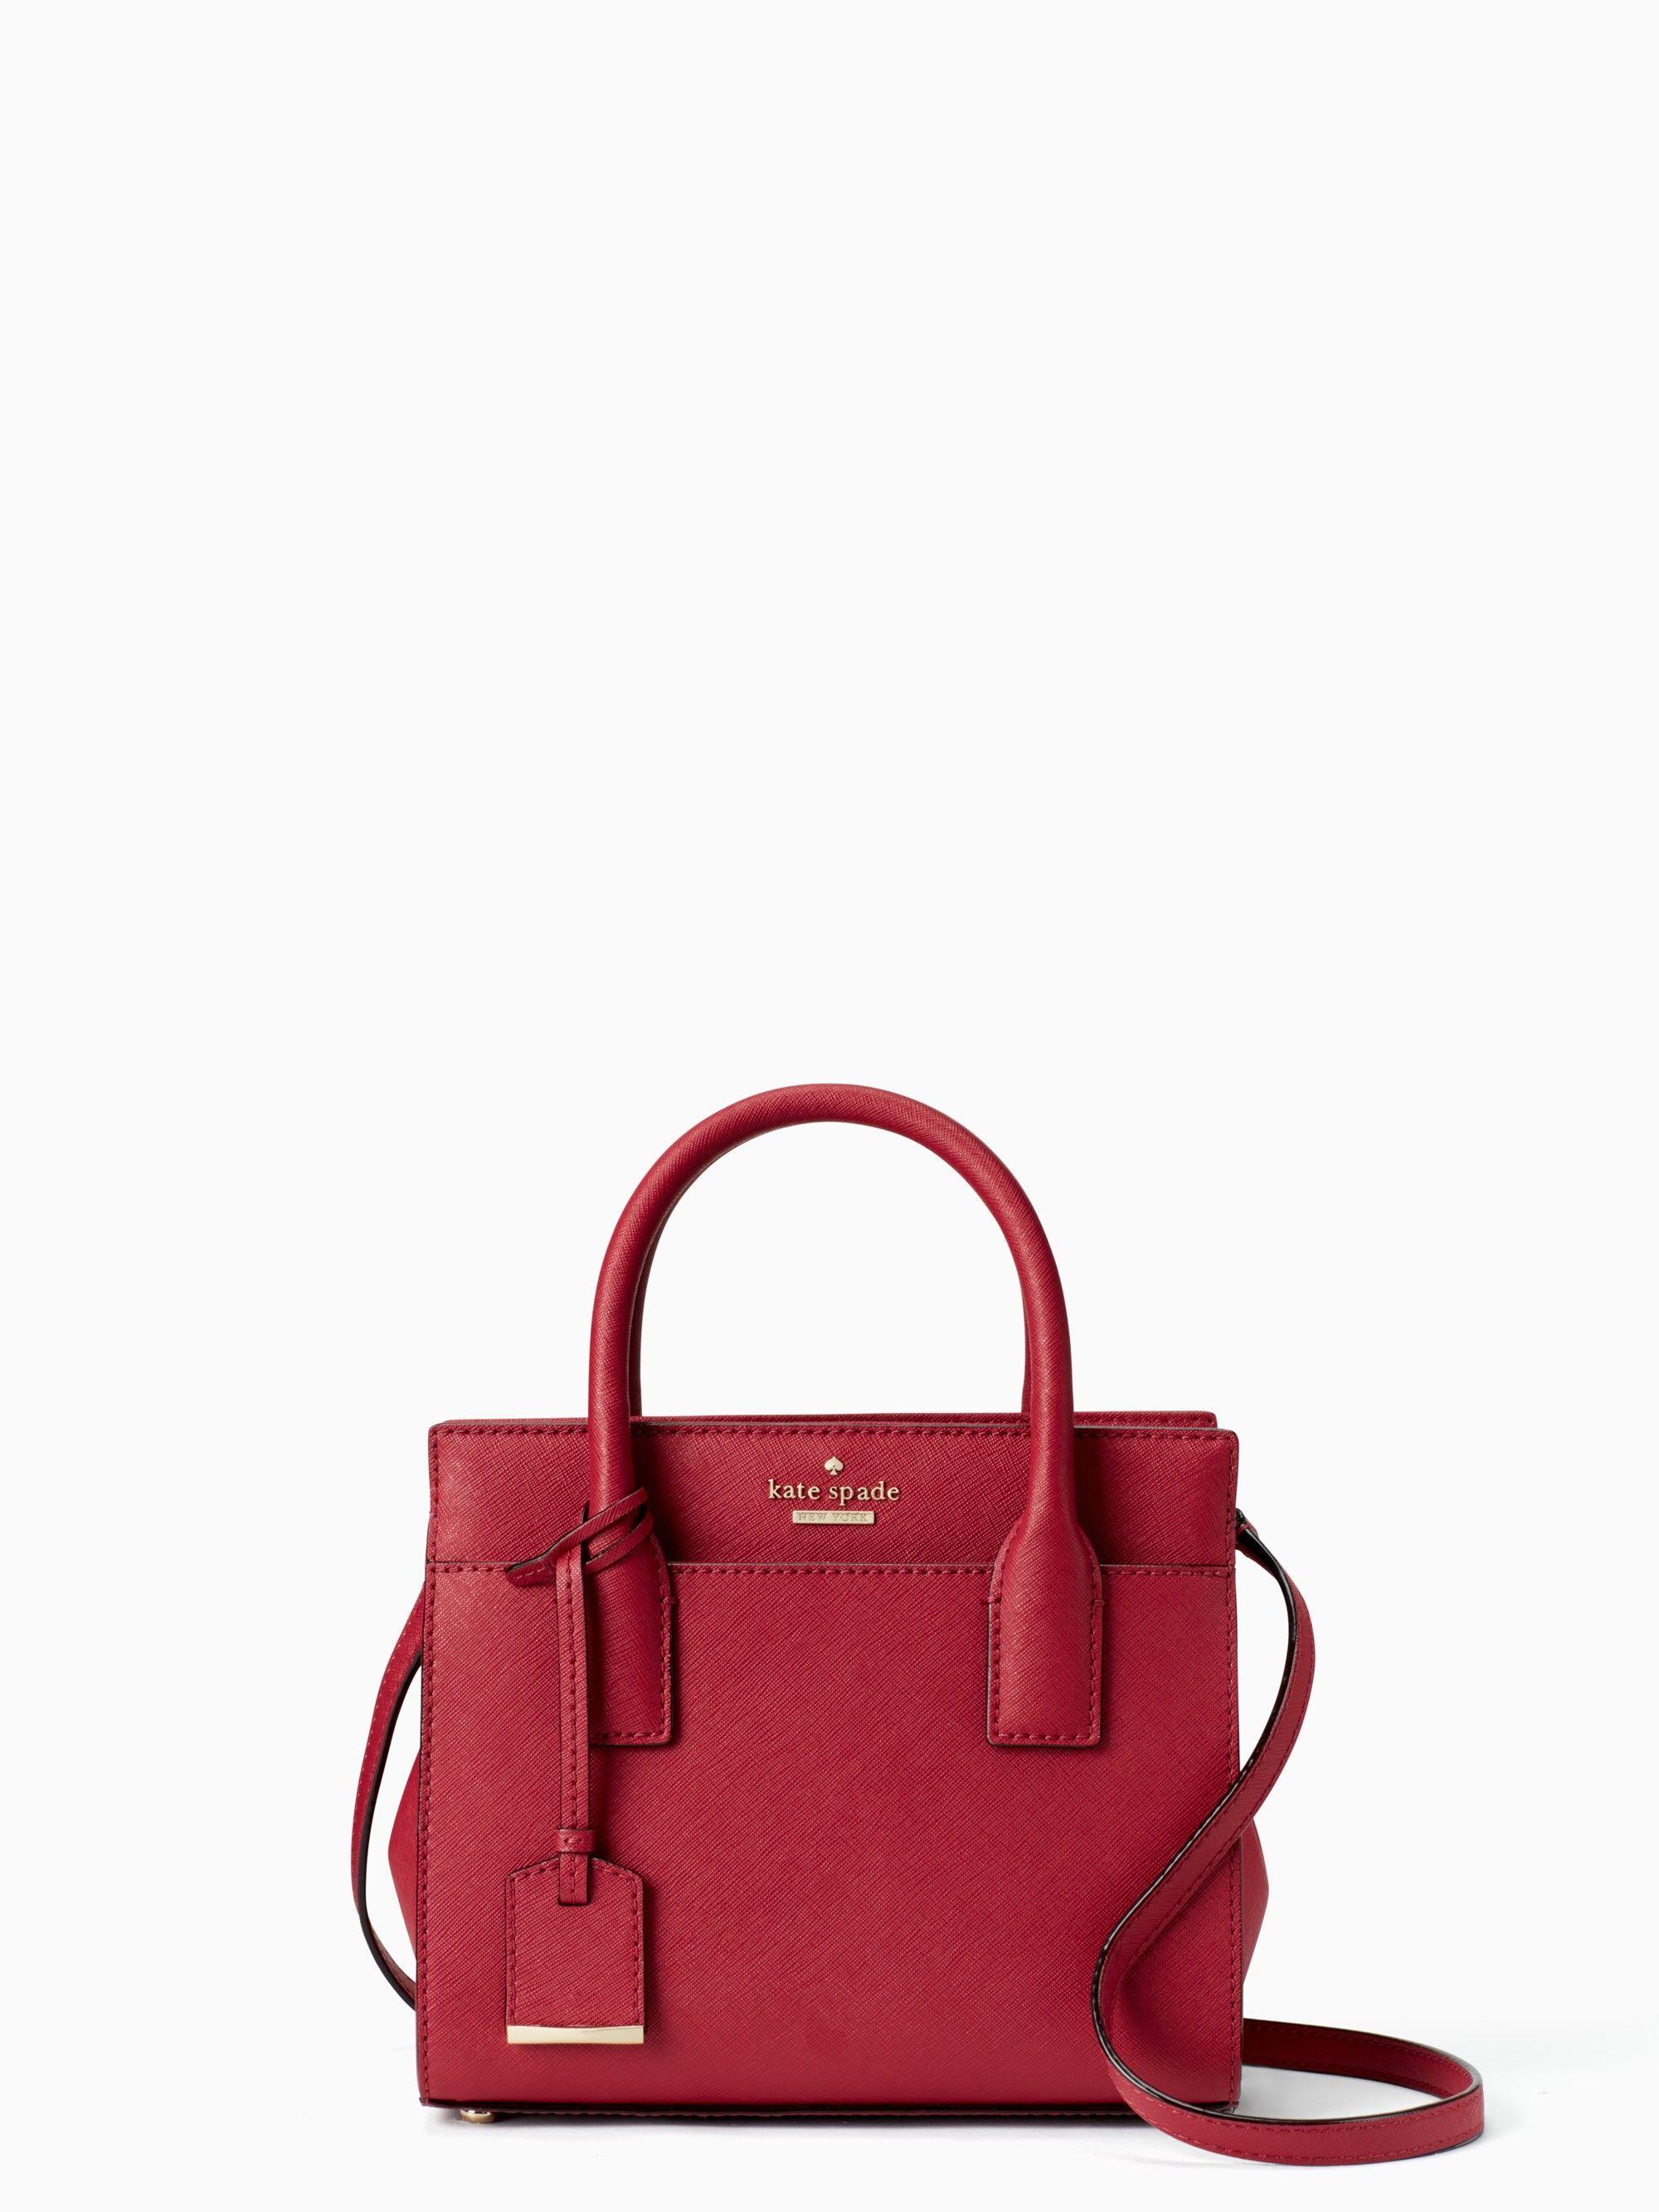 fe9fc3383 KATE SPADE cameron street mini candace. #katespade #bags #leather #lining  #travel bags #weekend #